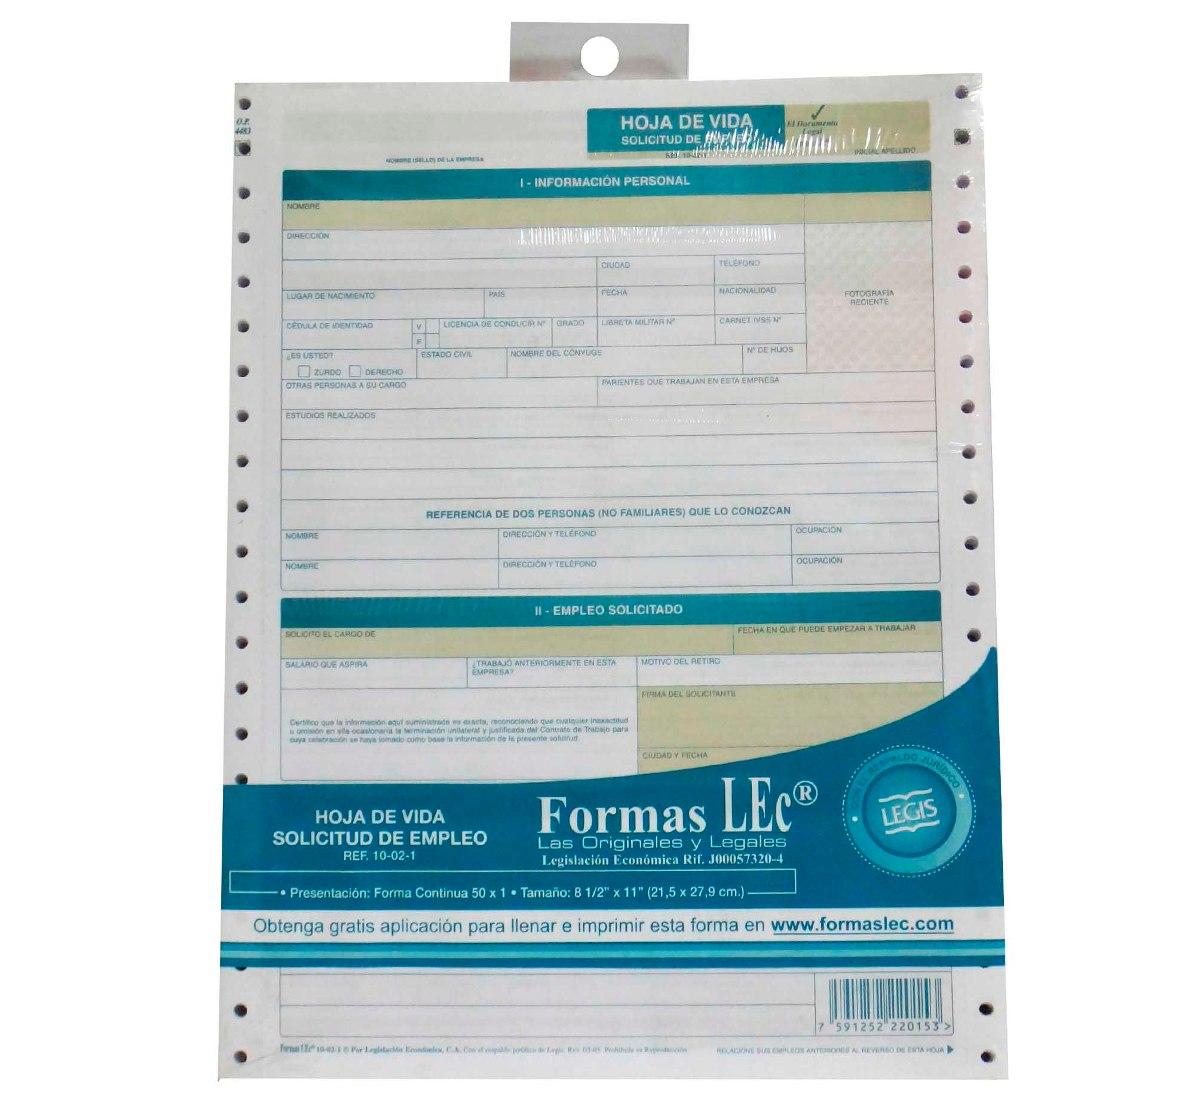 Formas Lec Hoja De Vida Solicitud De Empleo Ref 10-02-1 - Bs. 8.500 ...